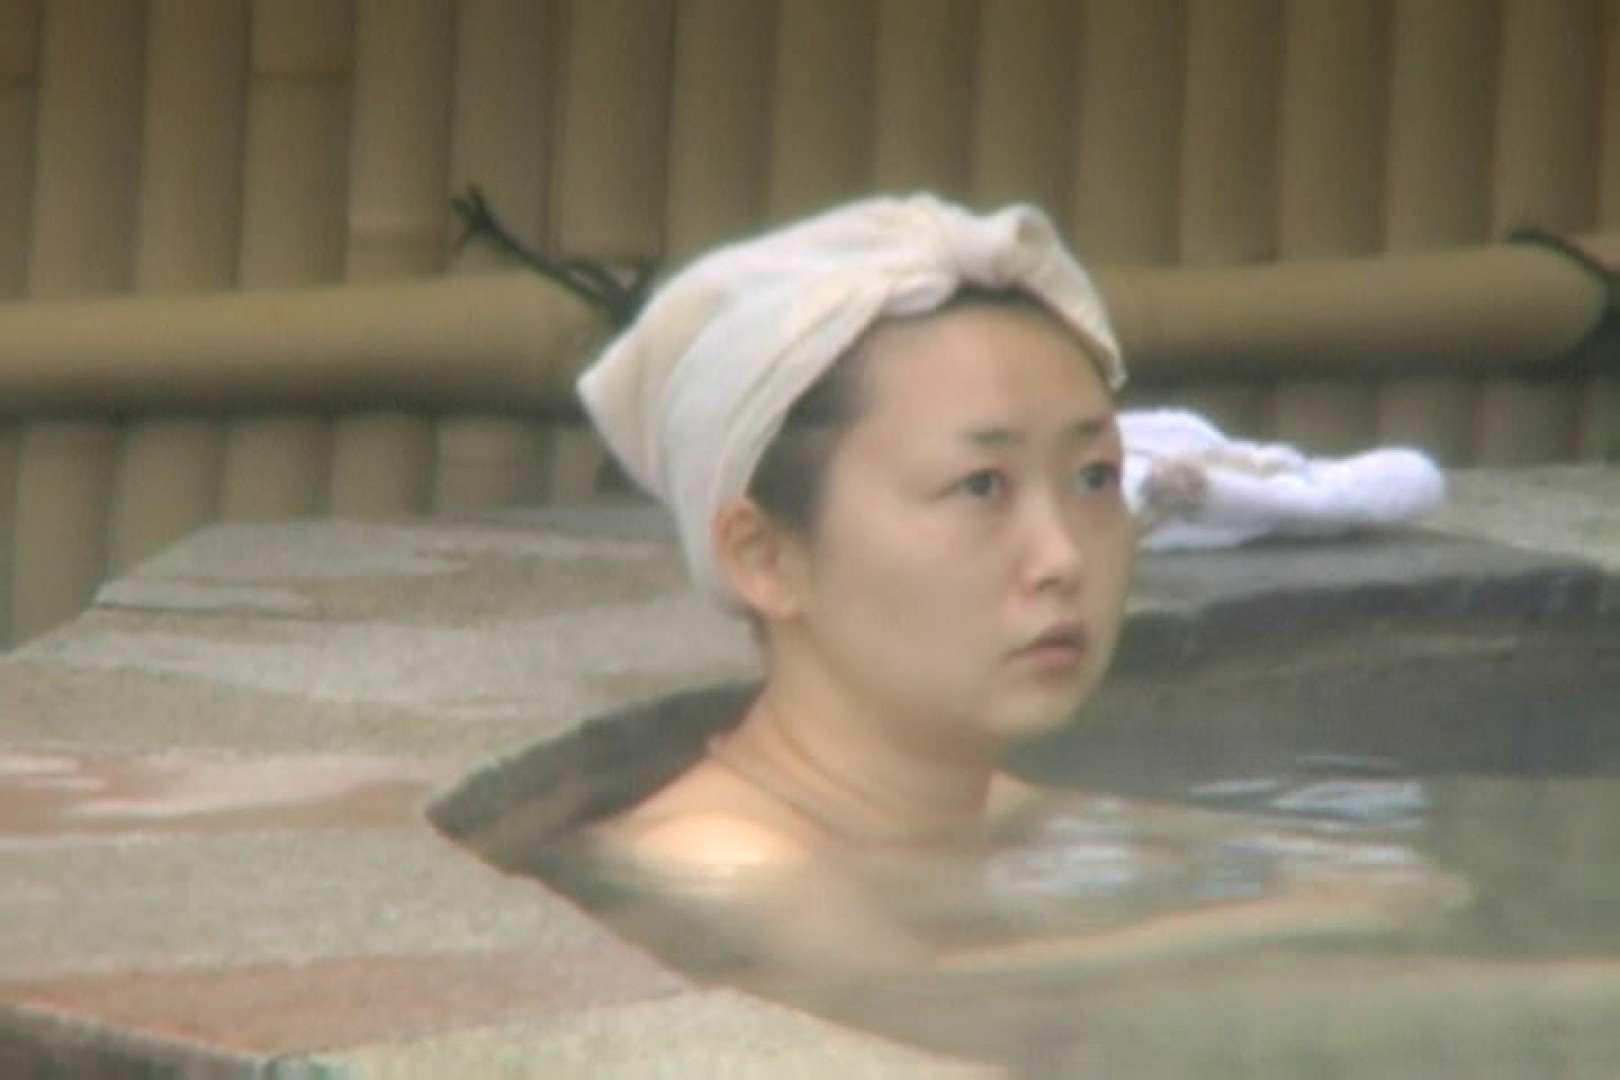 Aquaな露天風呂Vol.564 OL  87連発 29